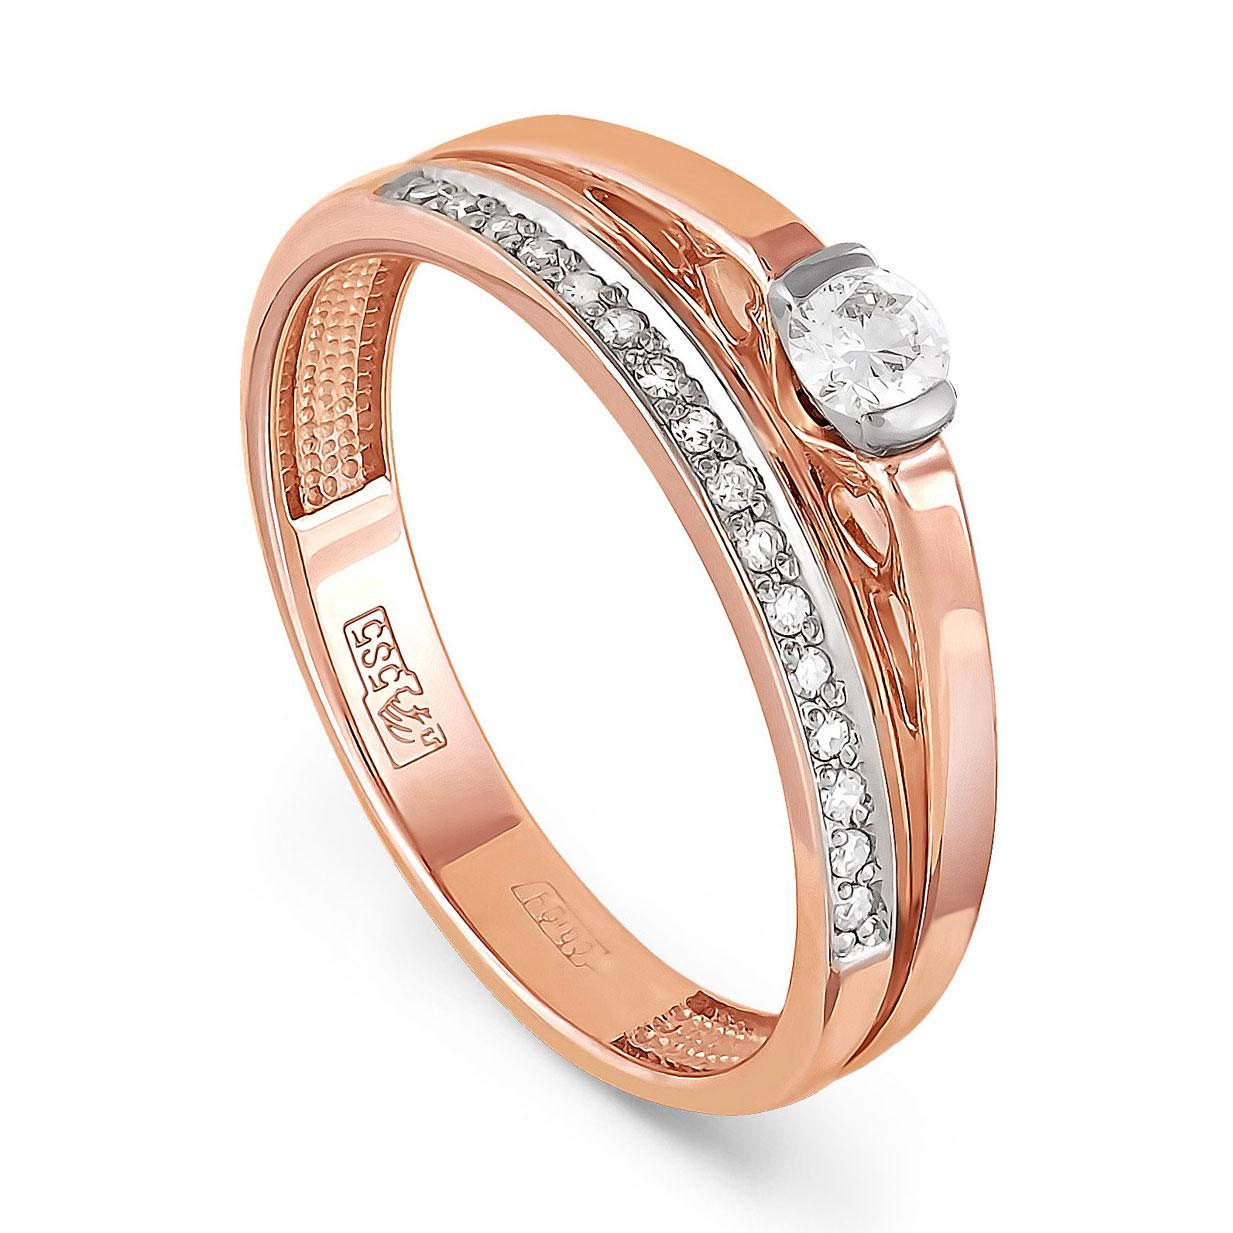 Золотое кольцо Бриллиант арт. 1-0326-1000 1-0326-1000